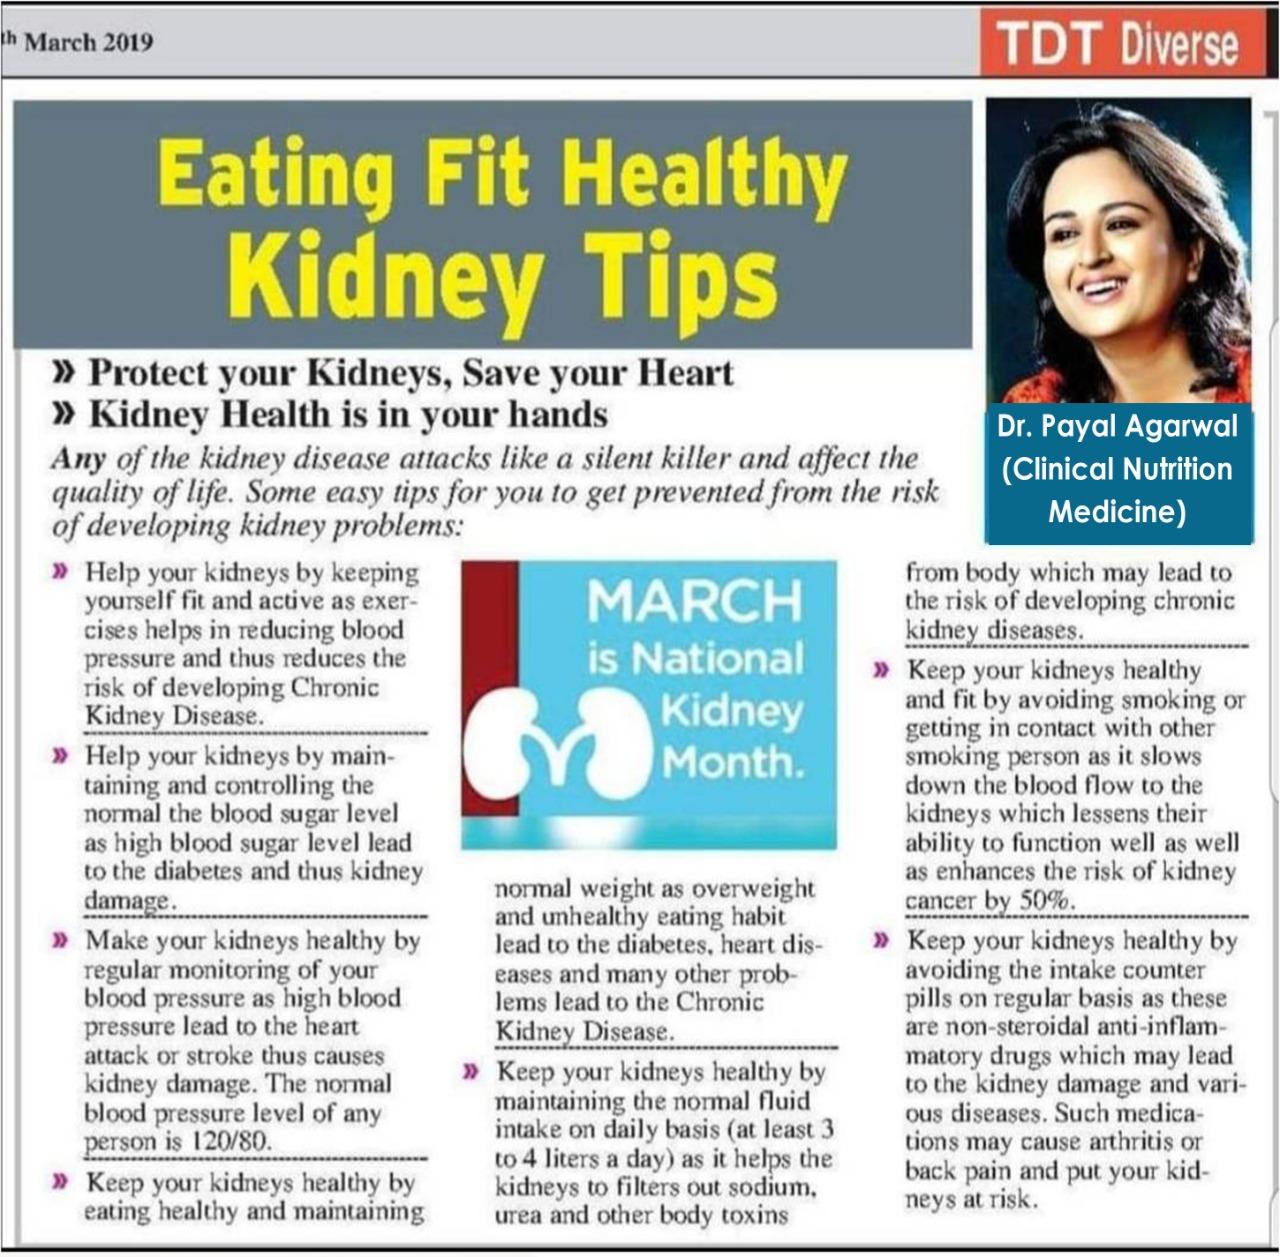 Eating Fit Healthy Kidney